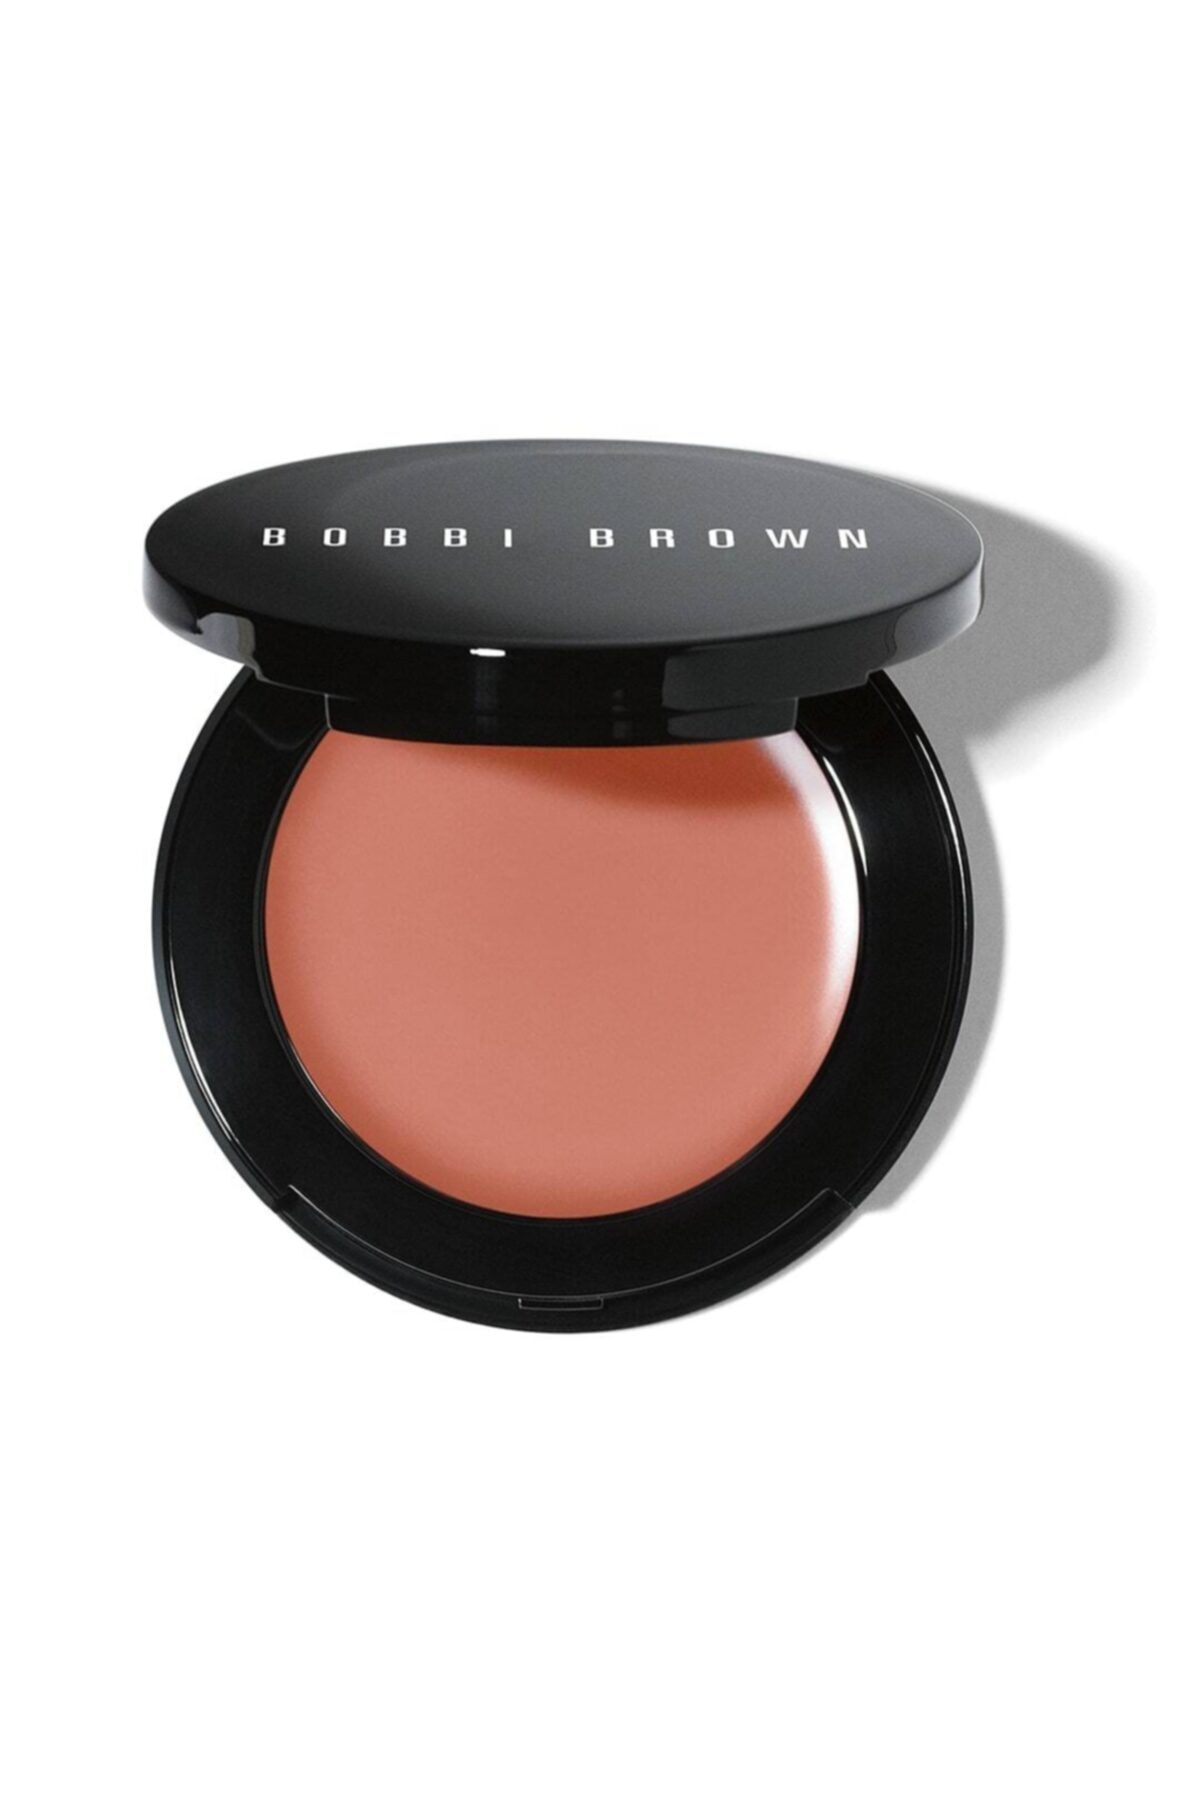 BOBBI BROWN Pot Rouge For Lips & Cheeks / Ruj & Allık 3.8 ml Fresh Melon 716170097152 1